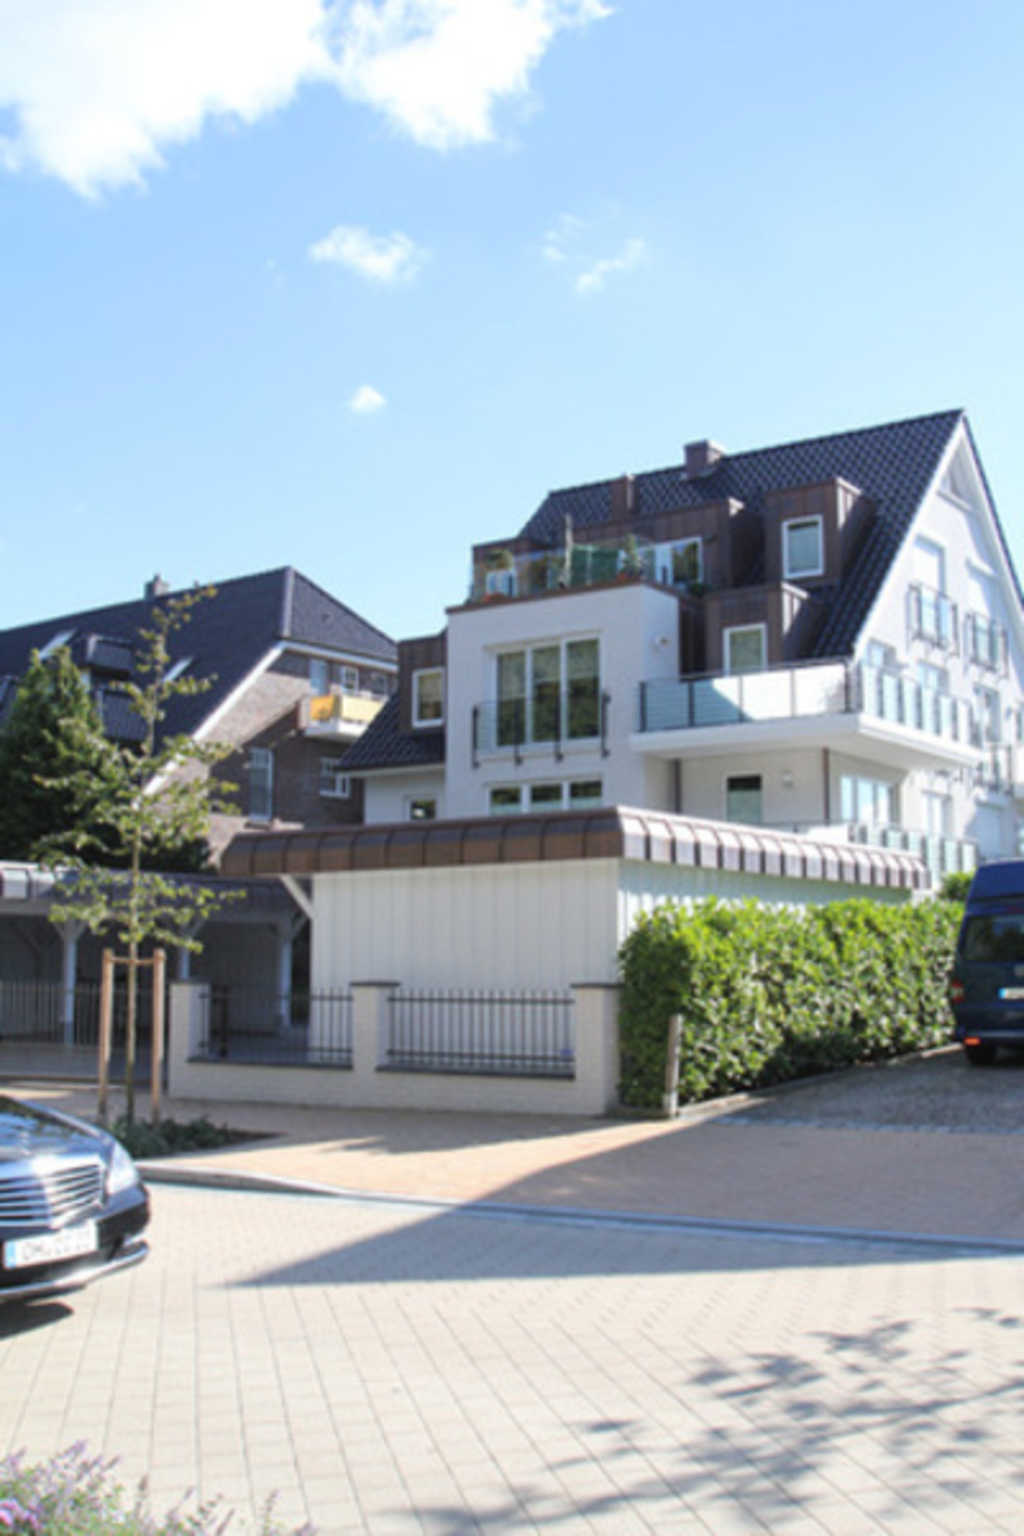 Parkresidenz Bergstraße 52, BG5202- 3 Zimmerwohnun